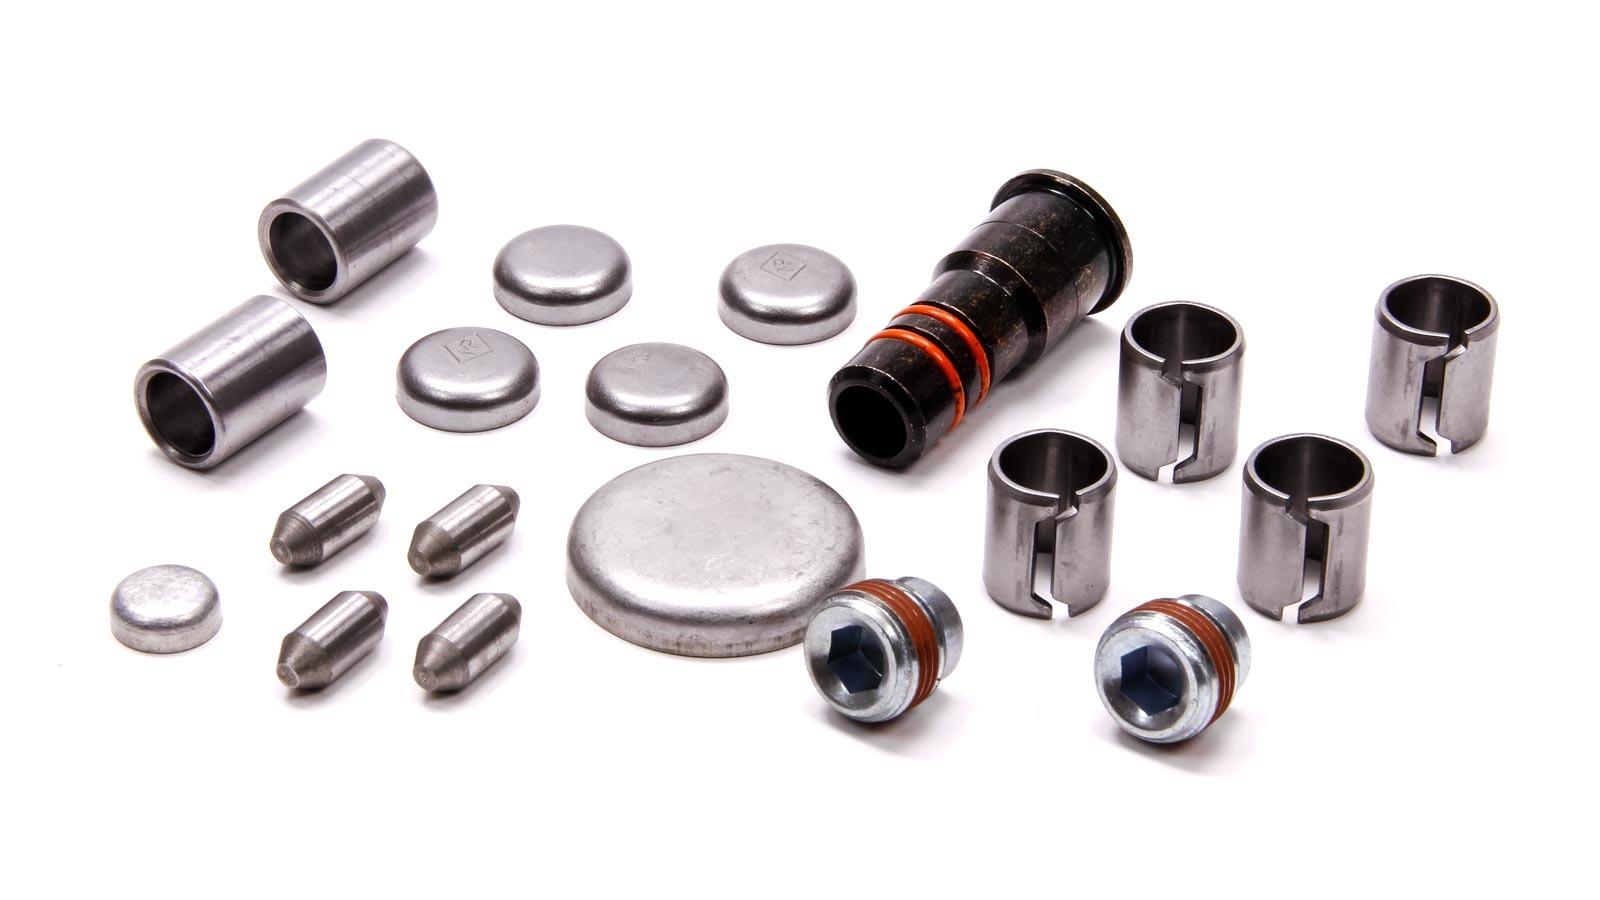 Ford Plug & Dowel Kit 4.6L Aluminum Blocks